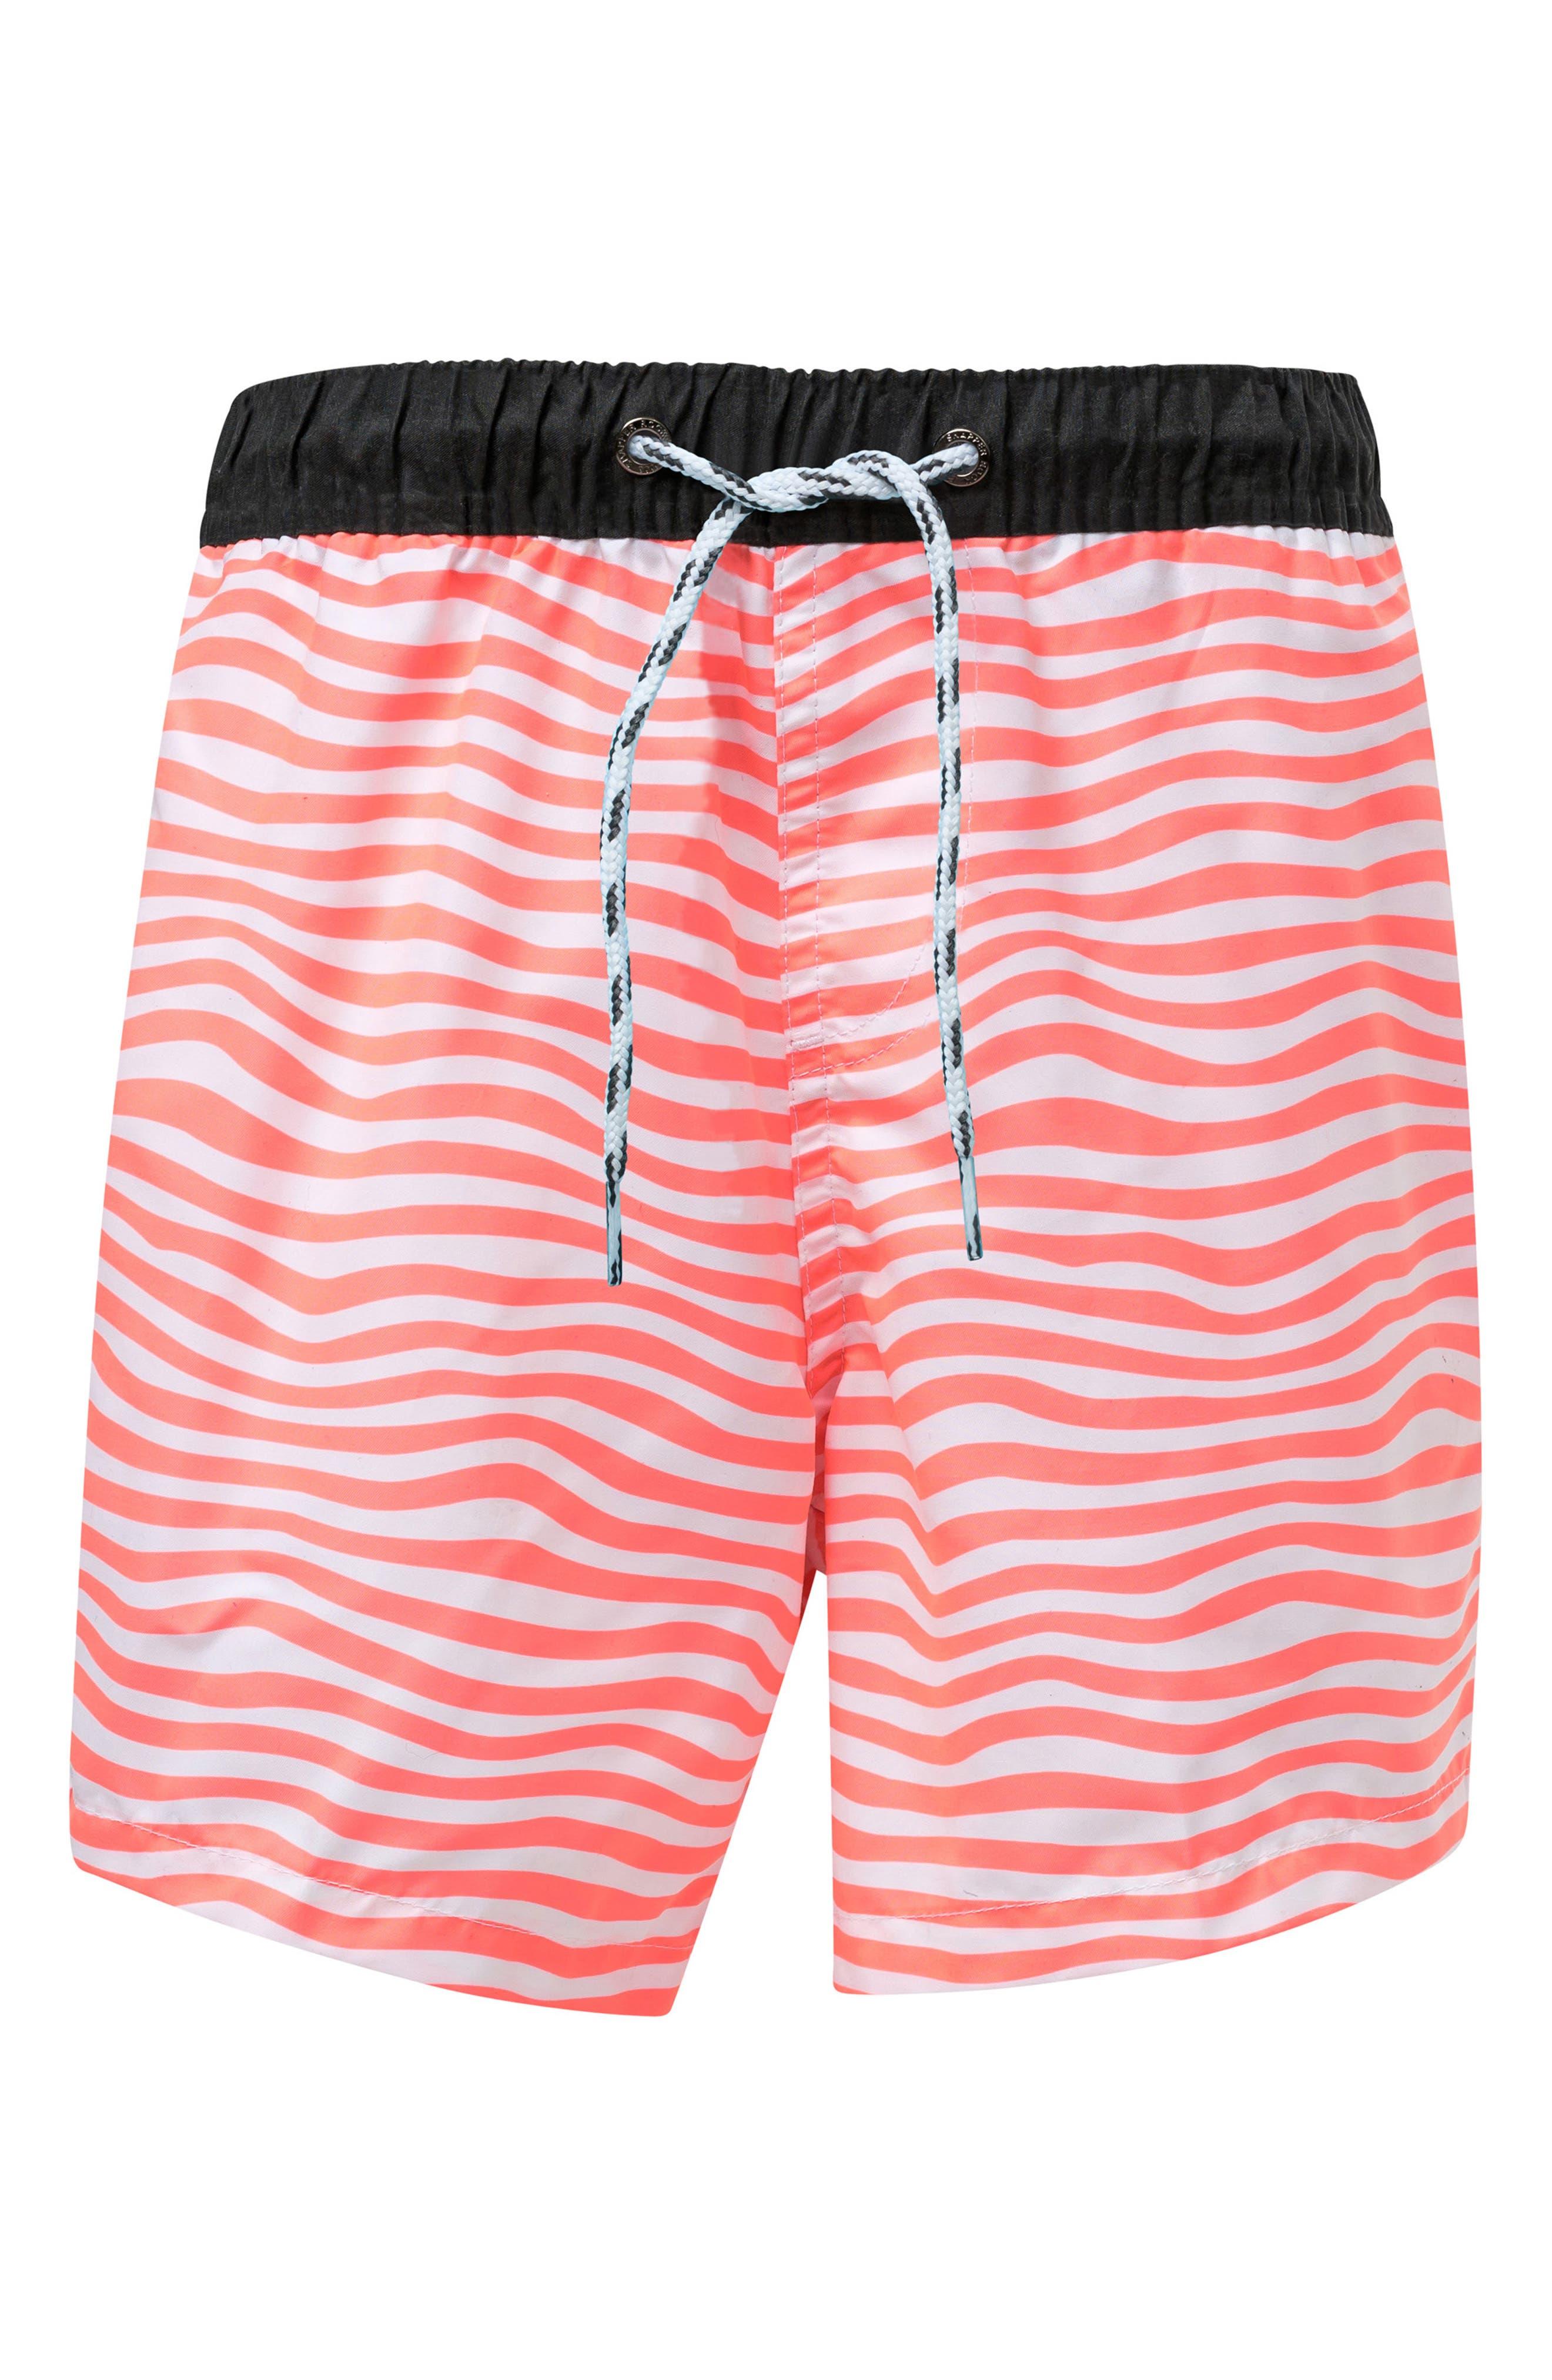 Orange Crush Board Shorts,                             Main thumbnail 1, color,                             BRIGHT ORANGE